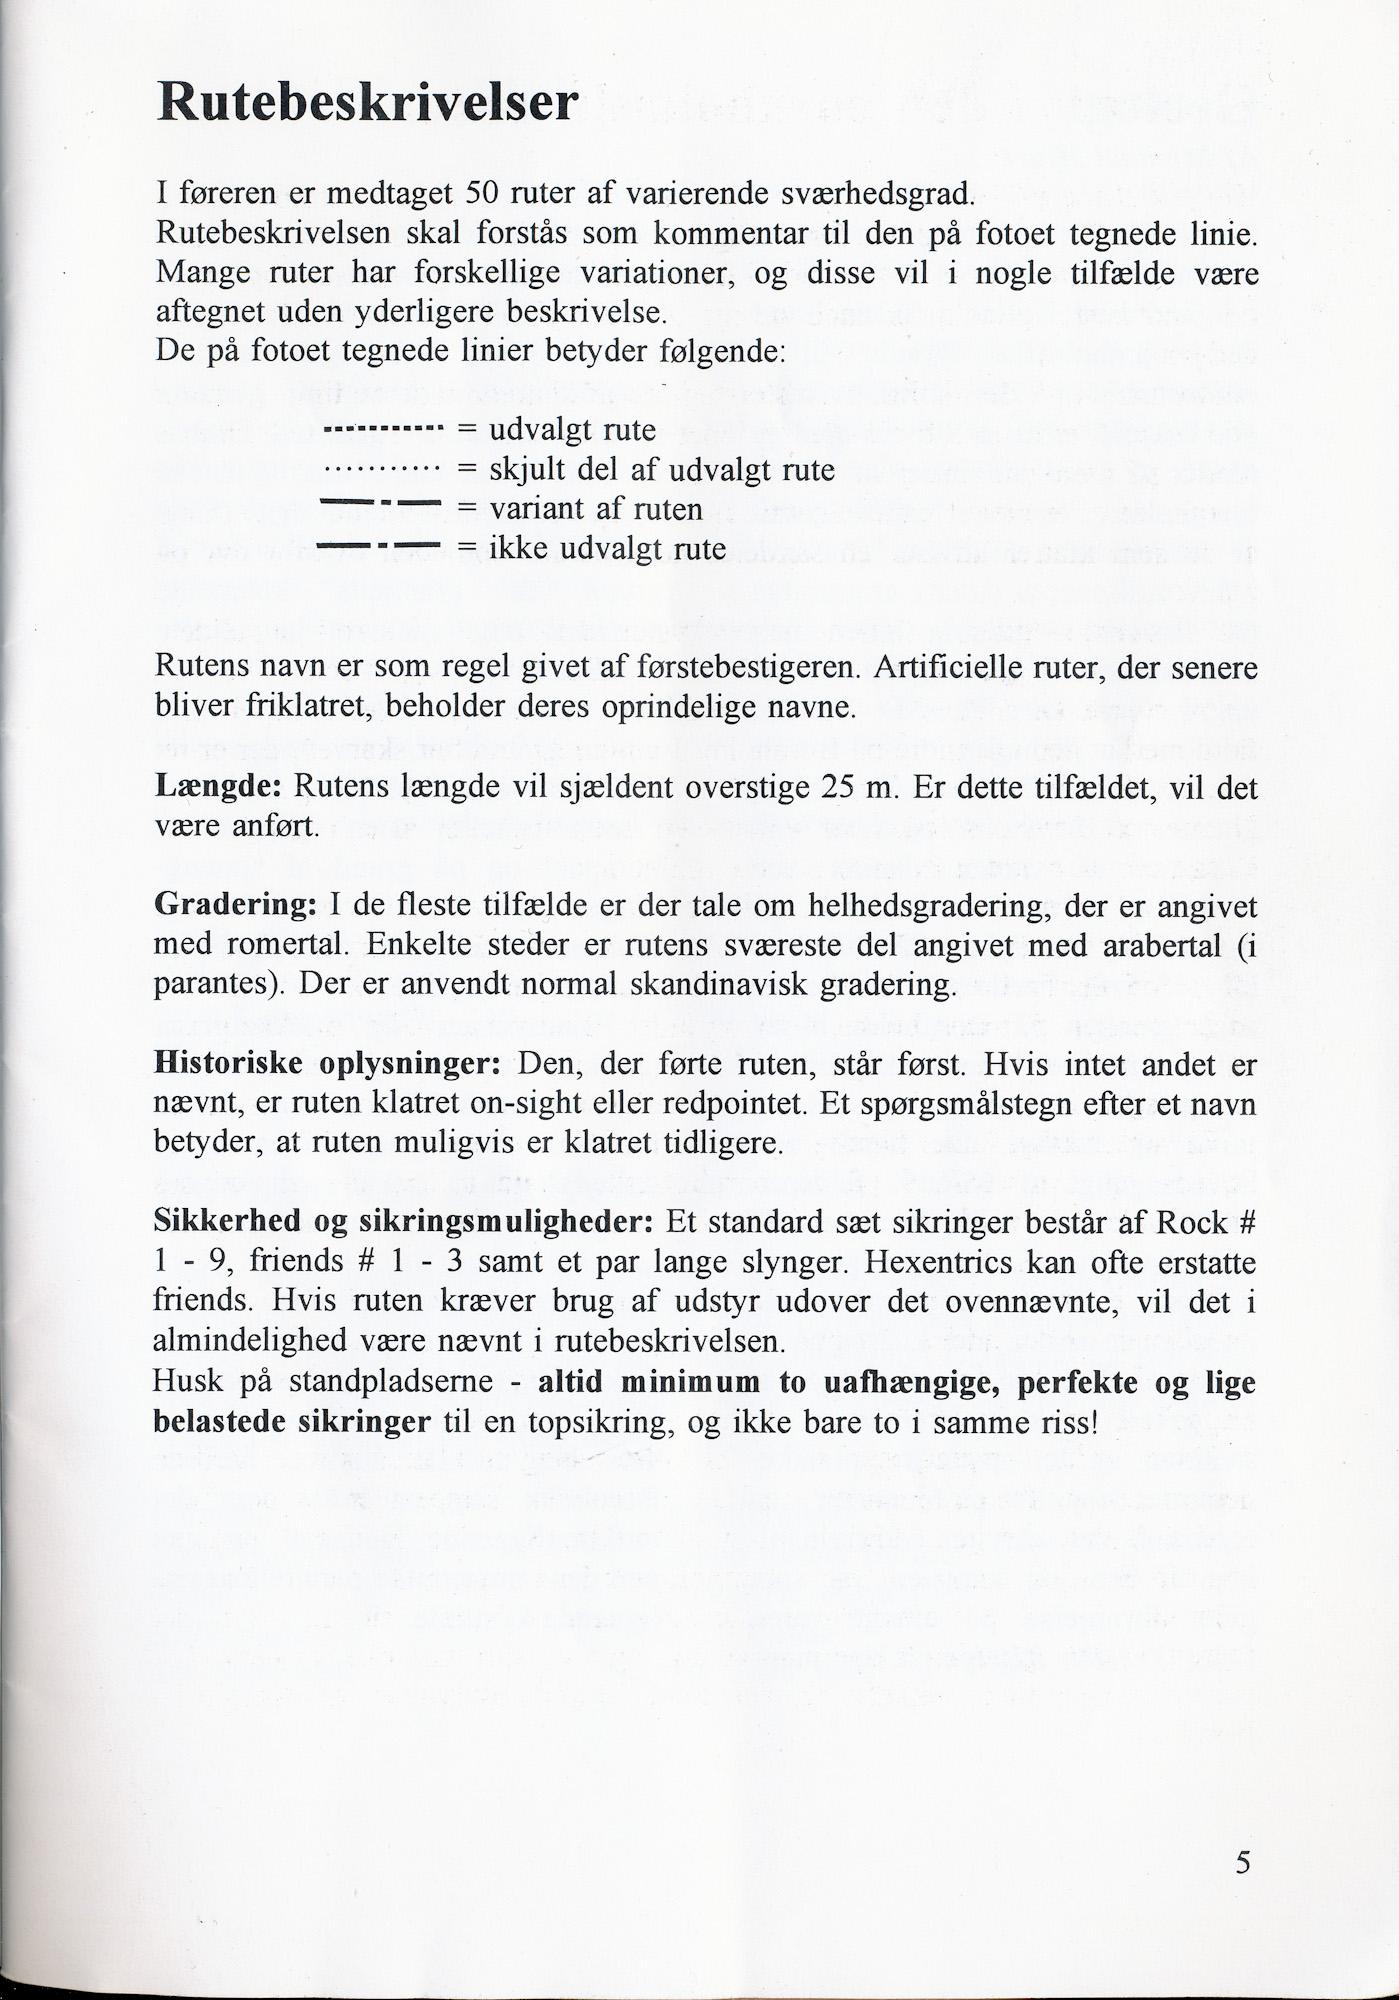 50 udvalgte ruter paa bornholm 1995 05.jpg